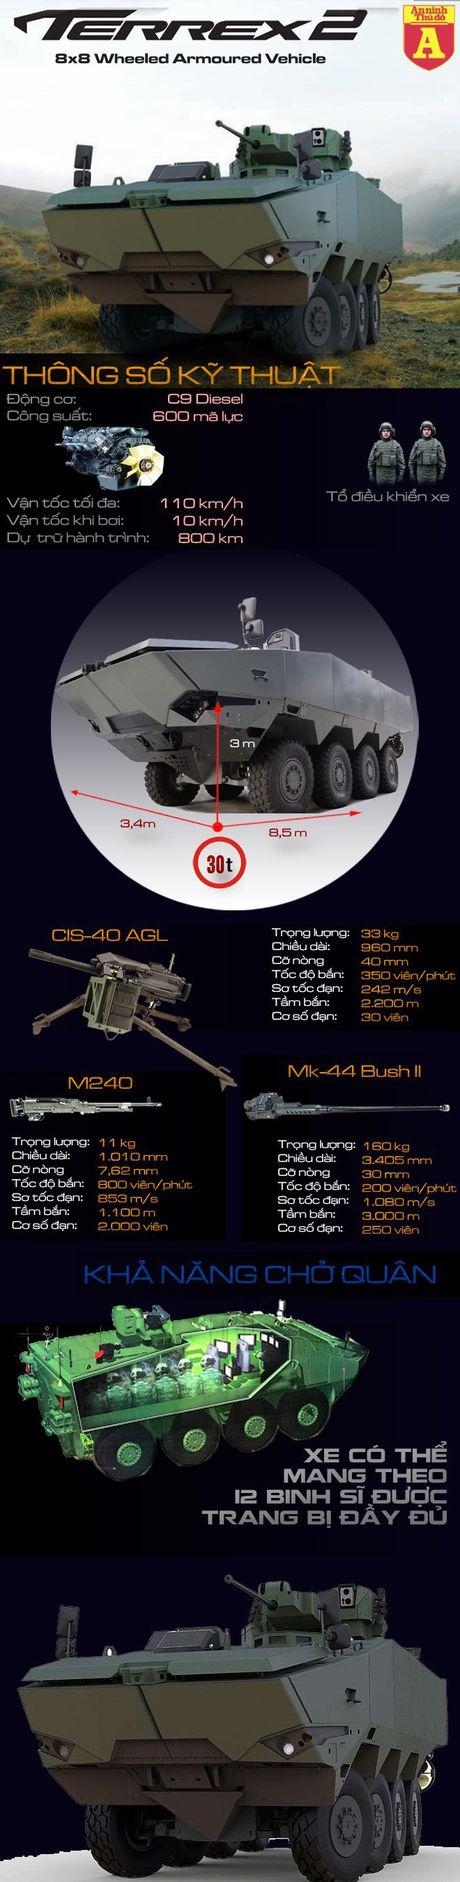 Ung cu vien thay the xe boc thep BTR-60 den tu Singapore - Anh 2